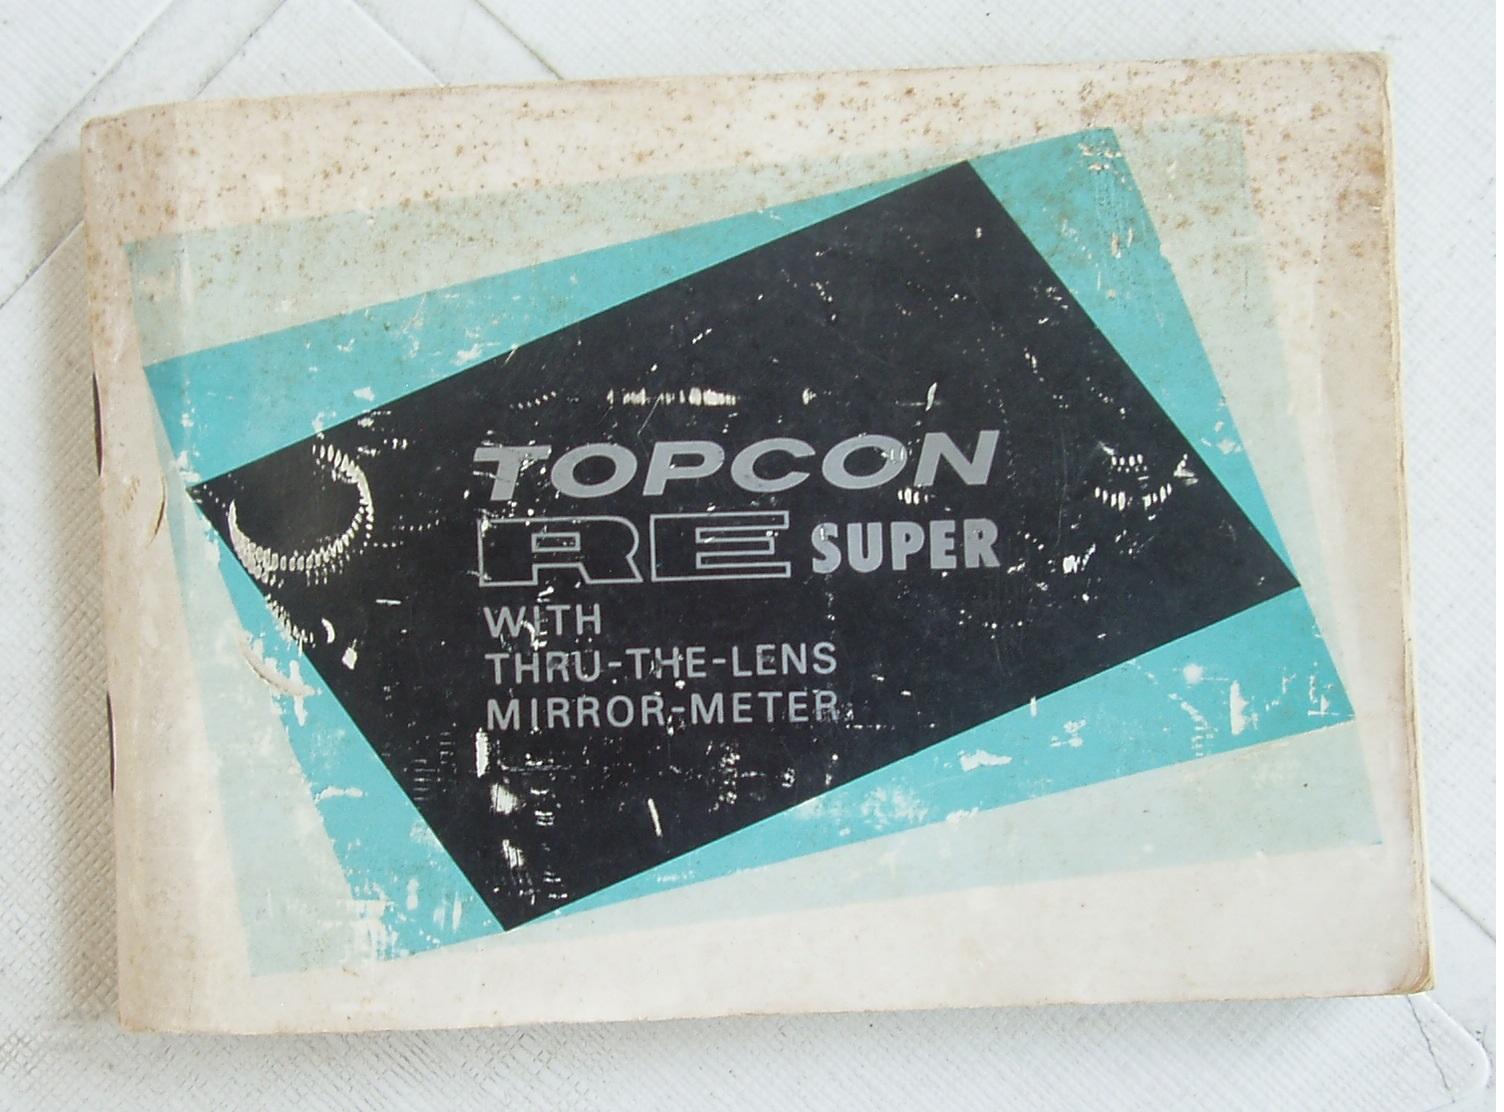 TOPCON RE Super  film camera - Manual Only - Vintage Manual